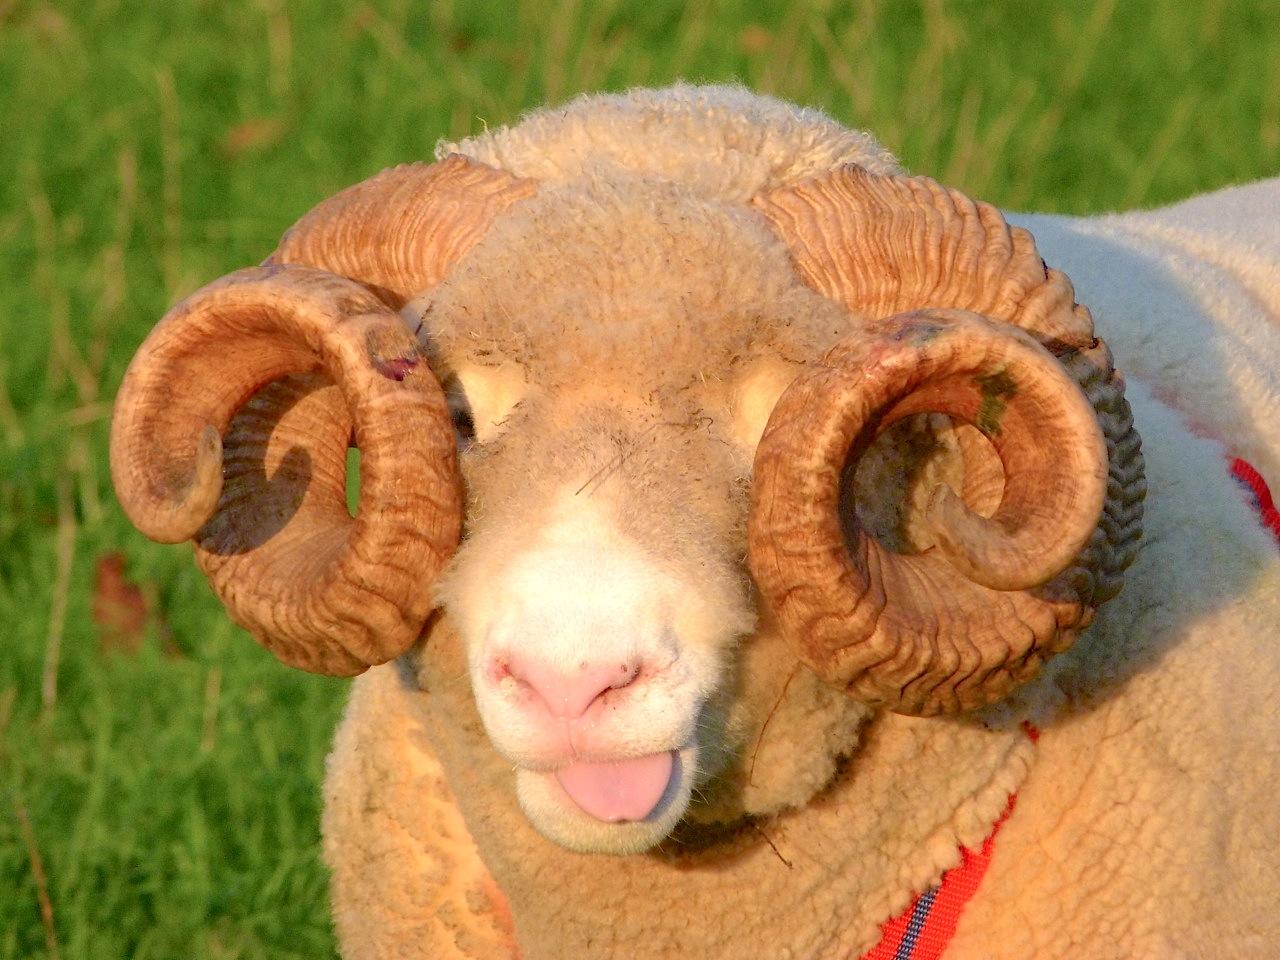 Flehmen Response in Sheep | ROLLING HARBOUR GALLERY